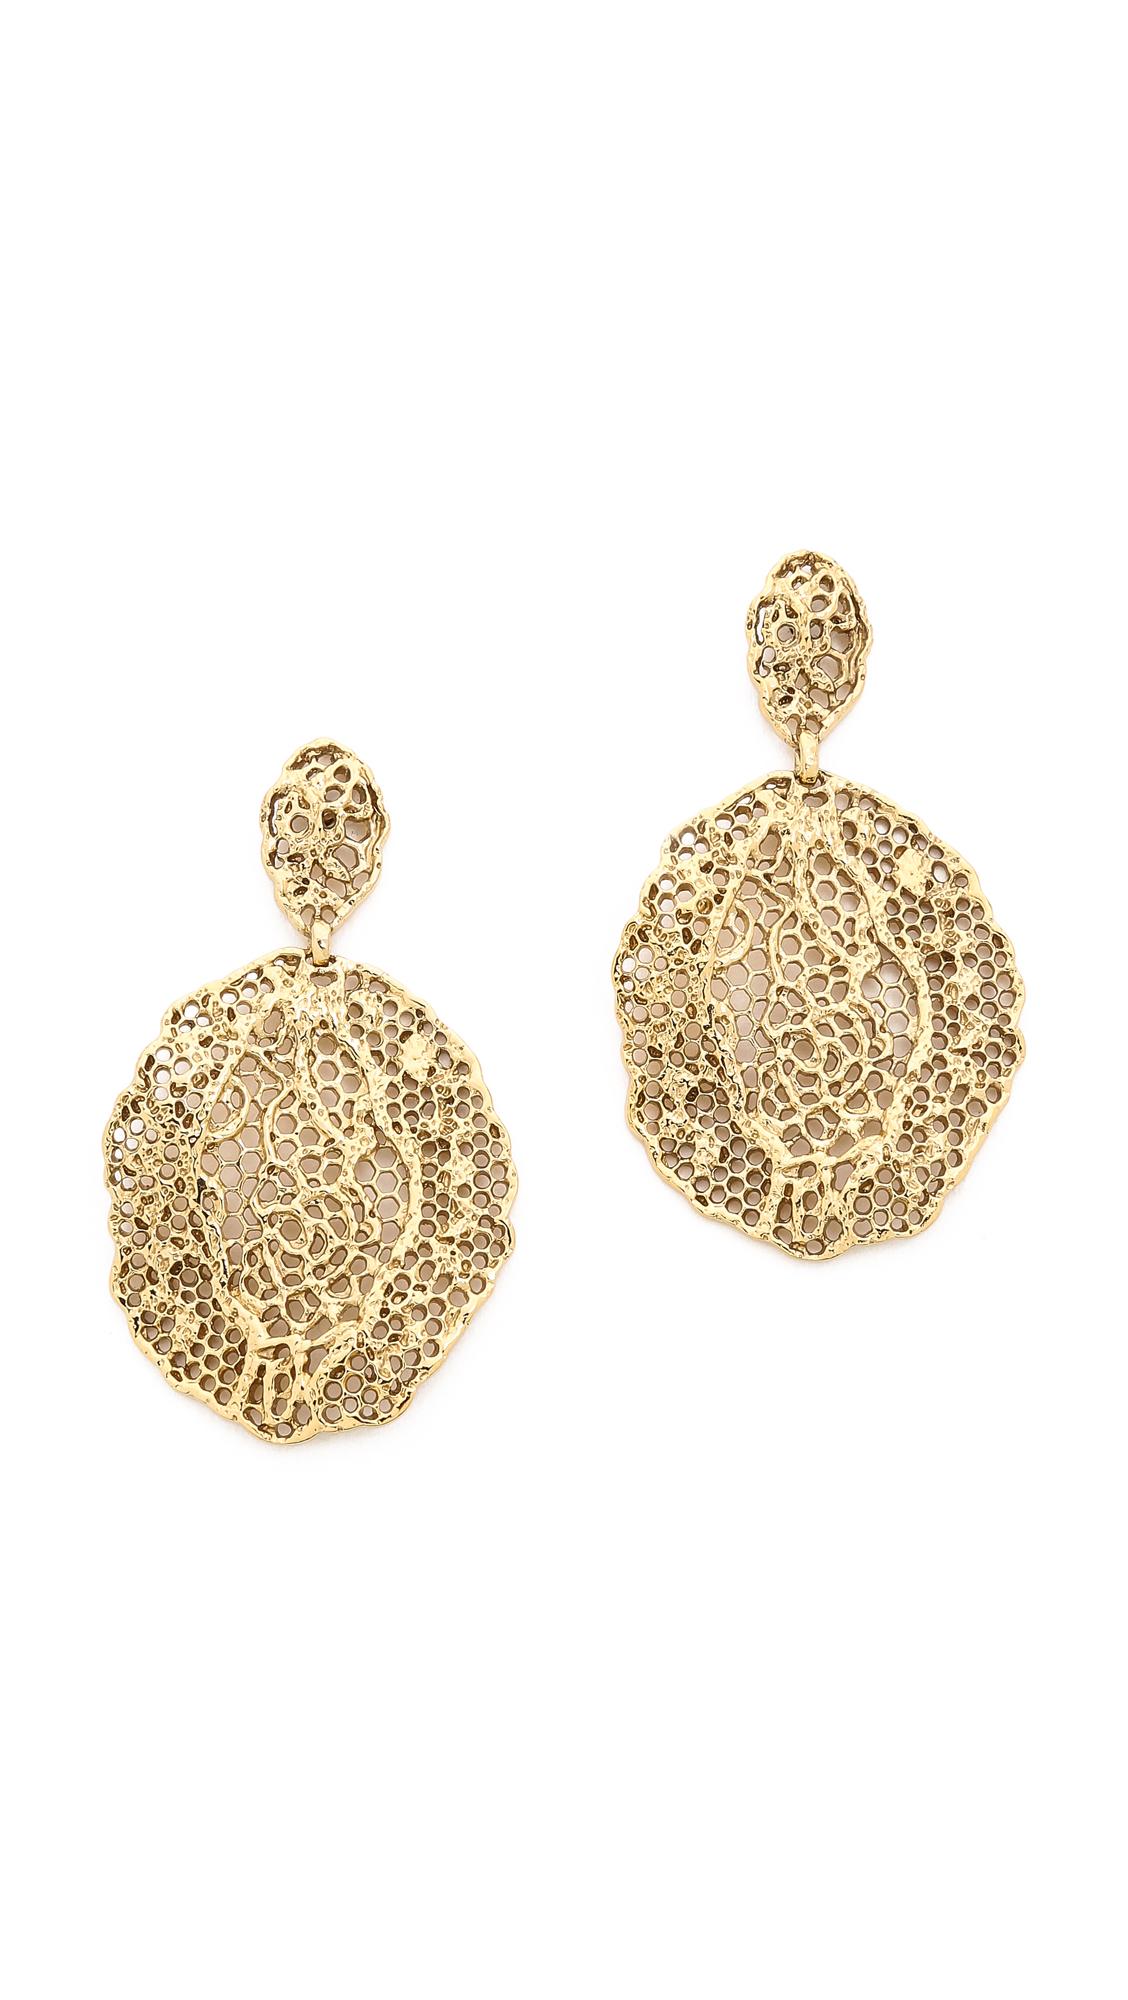 Aurelie Bidermann Lace Earrings - Gold at Shopbop